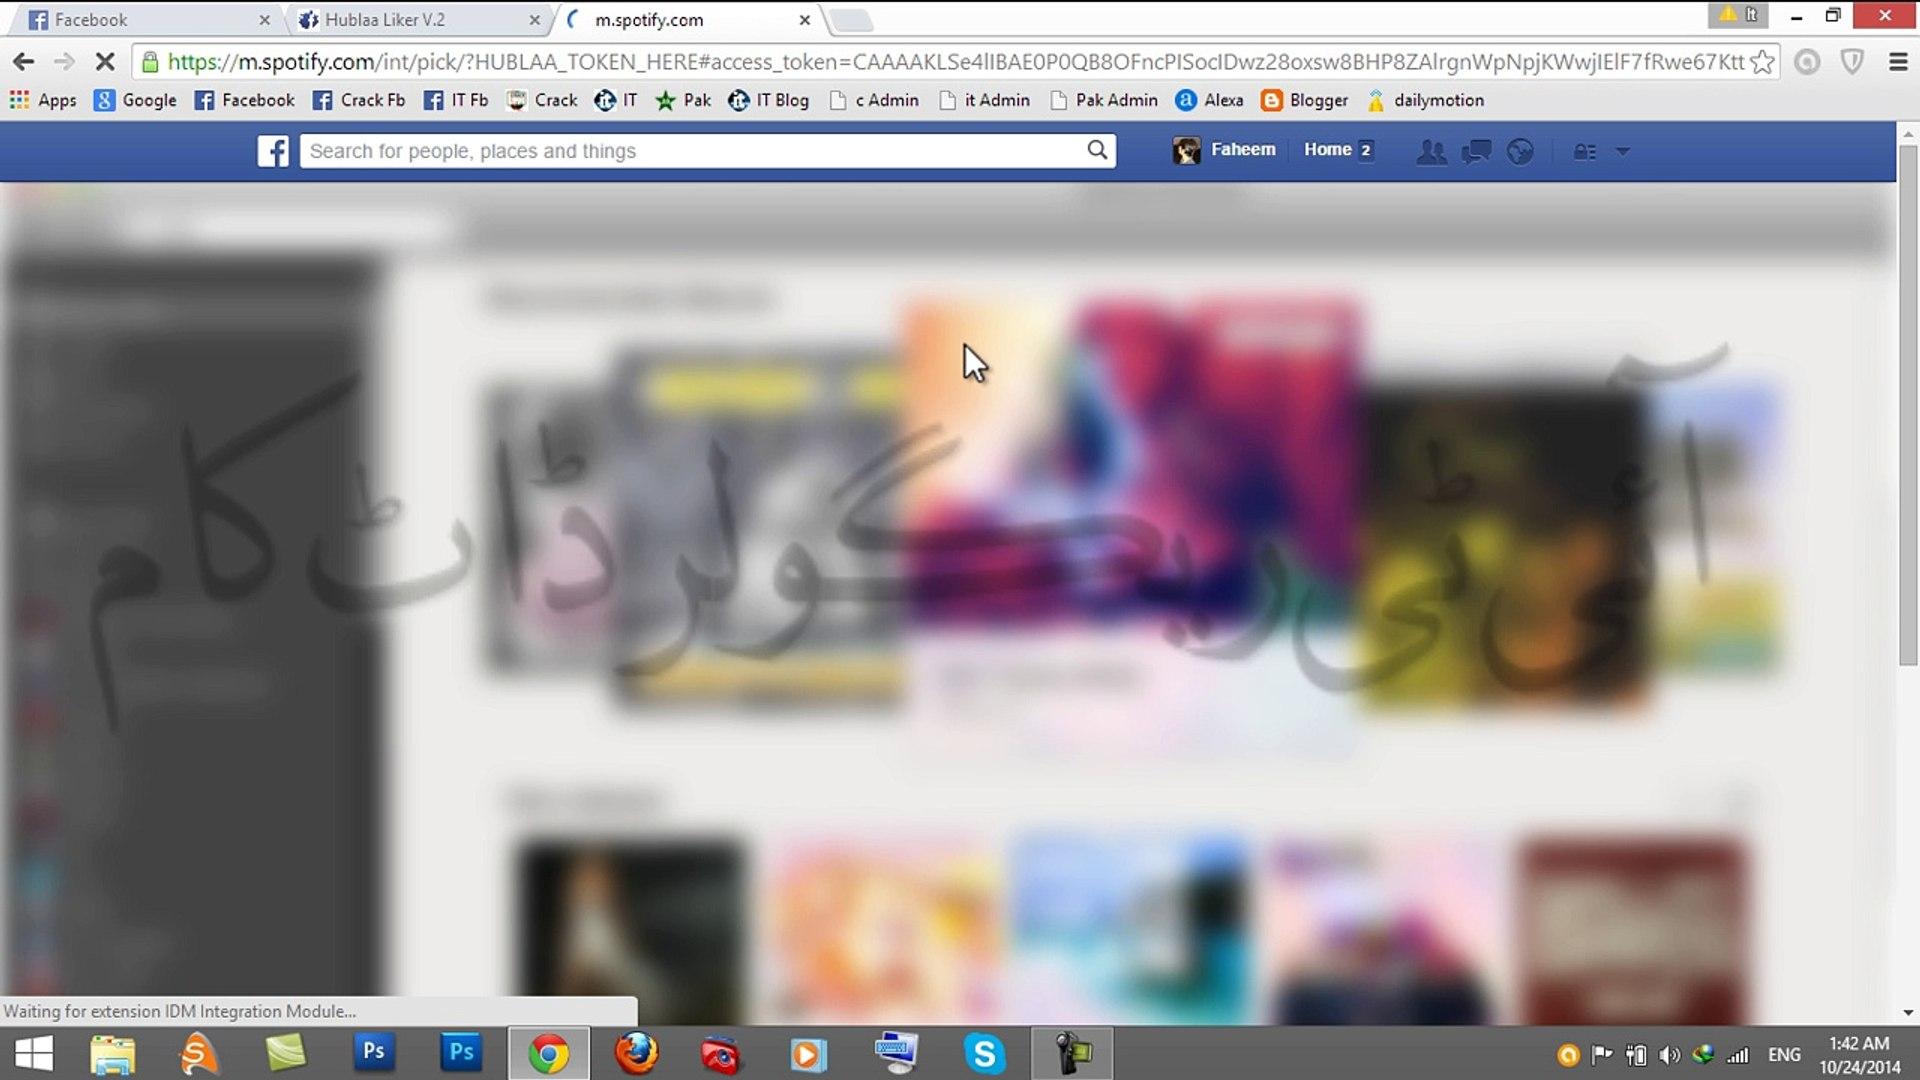 How to Free LIke Facebook Page 10,000 liker Free Urdu-Hindi